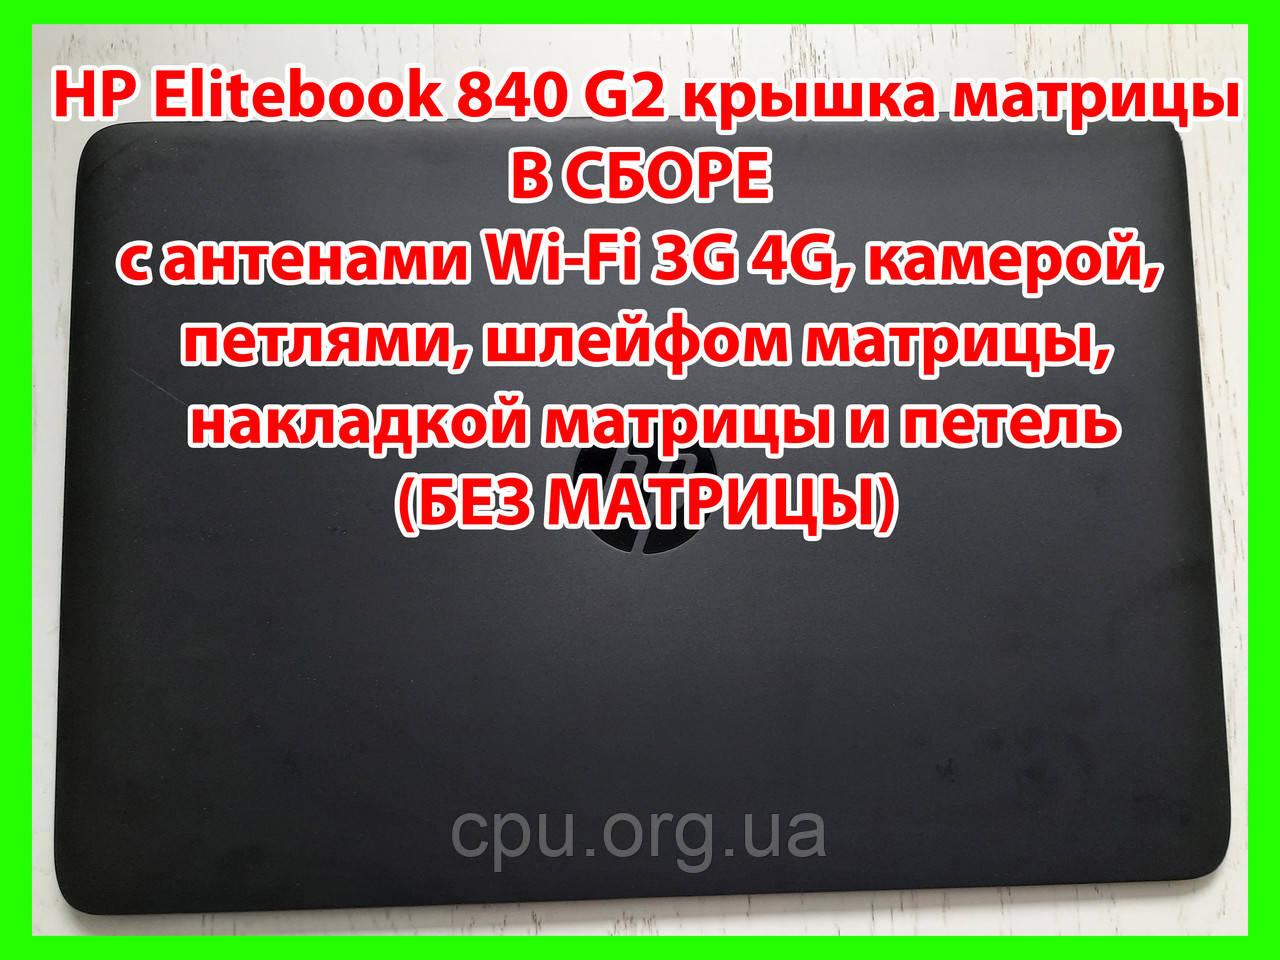 Крышка экрана в СБОРЕ HP Elitebook 840 G2 ( без матрицы)